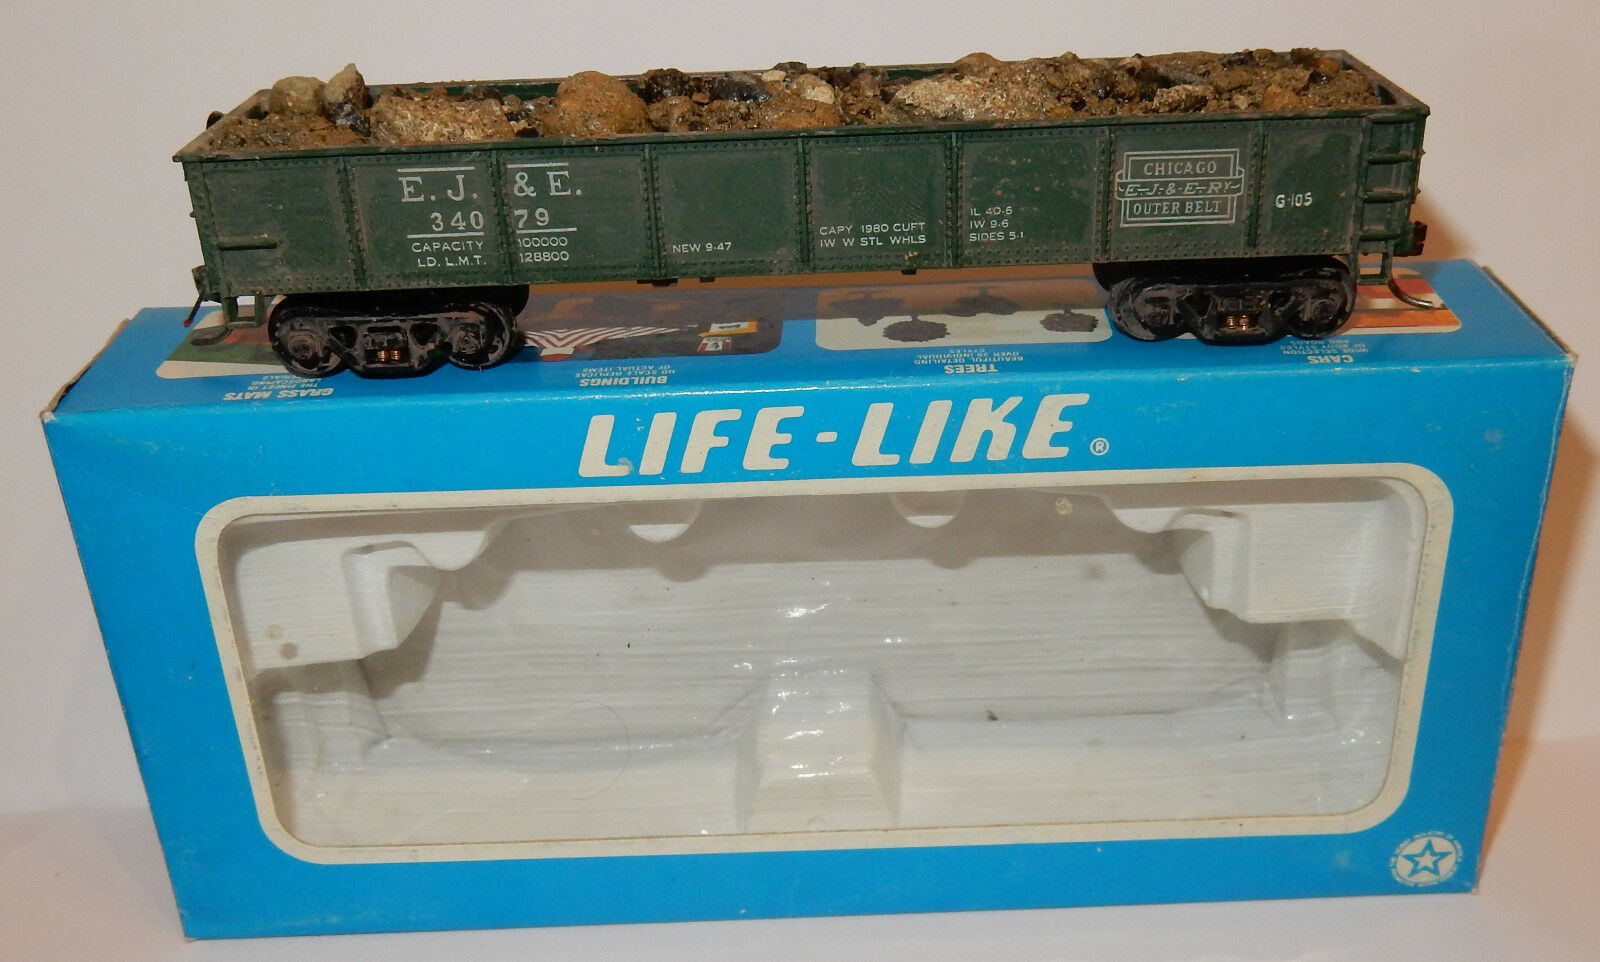 LIFE LIKE HO 1 87 VINTAGE 40 GONDOLA WAGON RAILROAD REF 5810 IN BOX